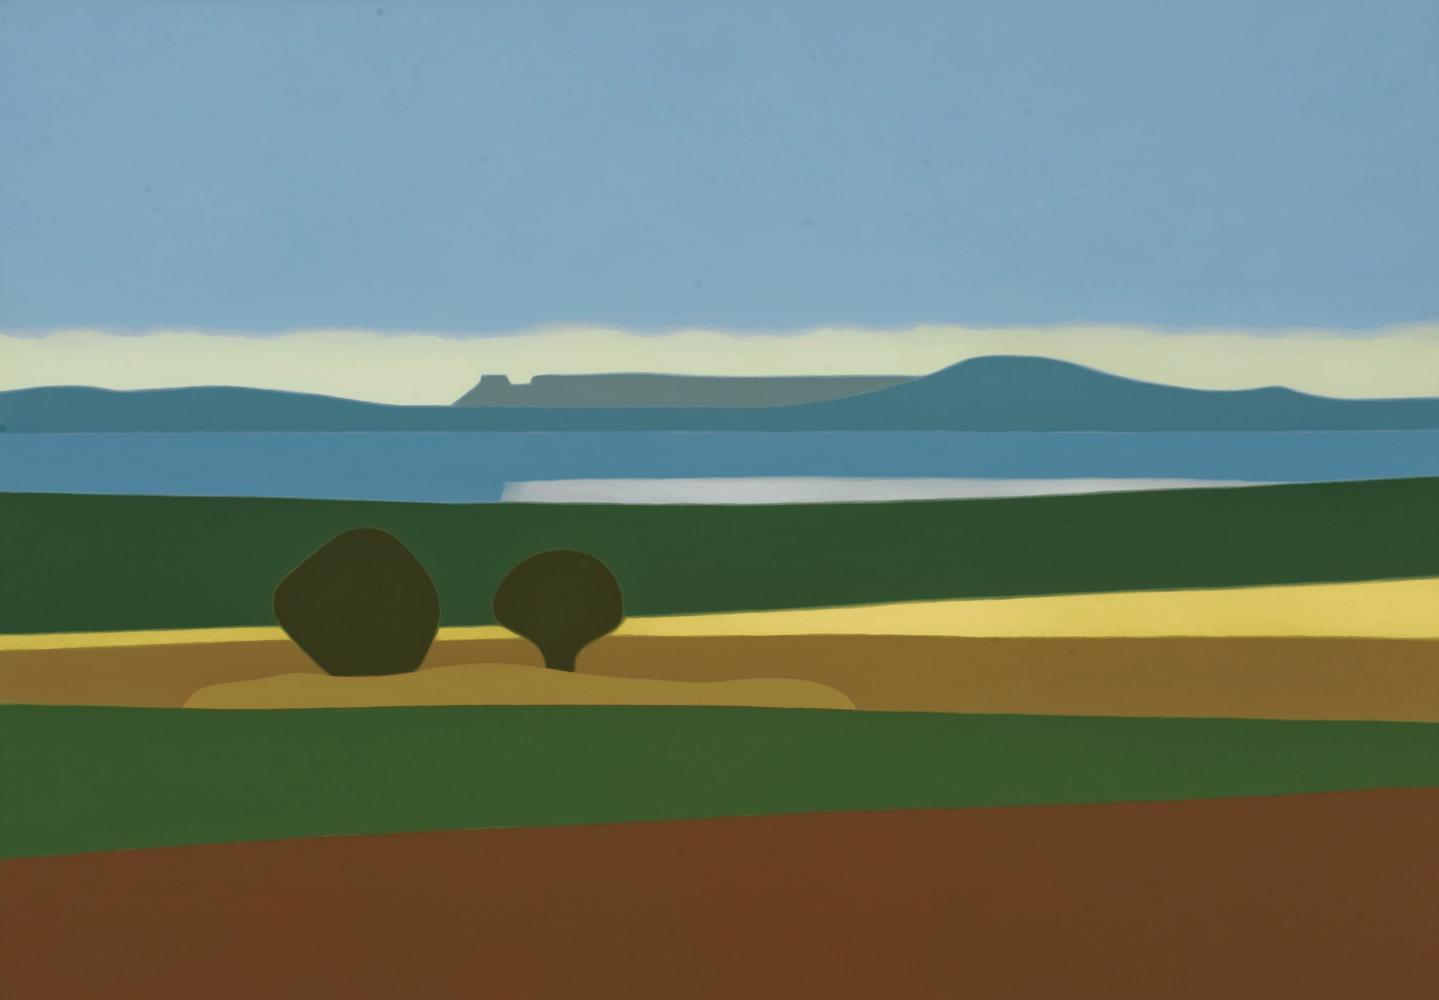 Embalse del Ebro, 81 x 116 cm, óleo lienzo, 2011.